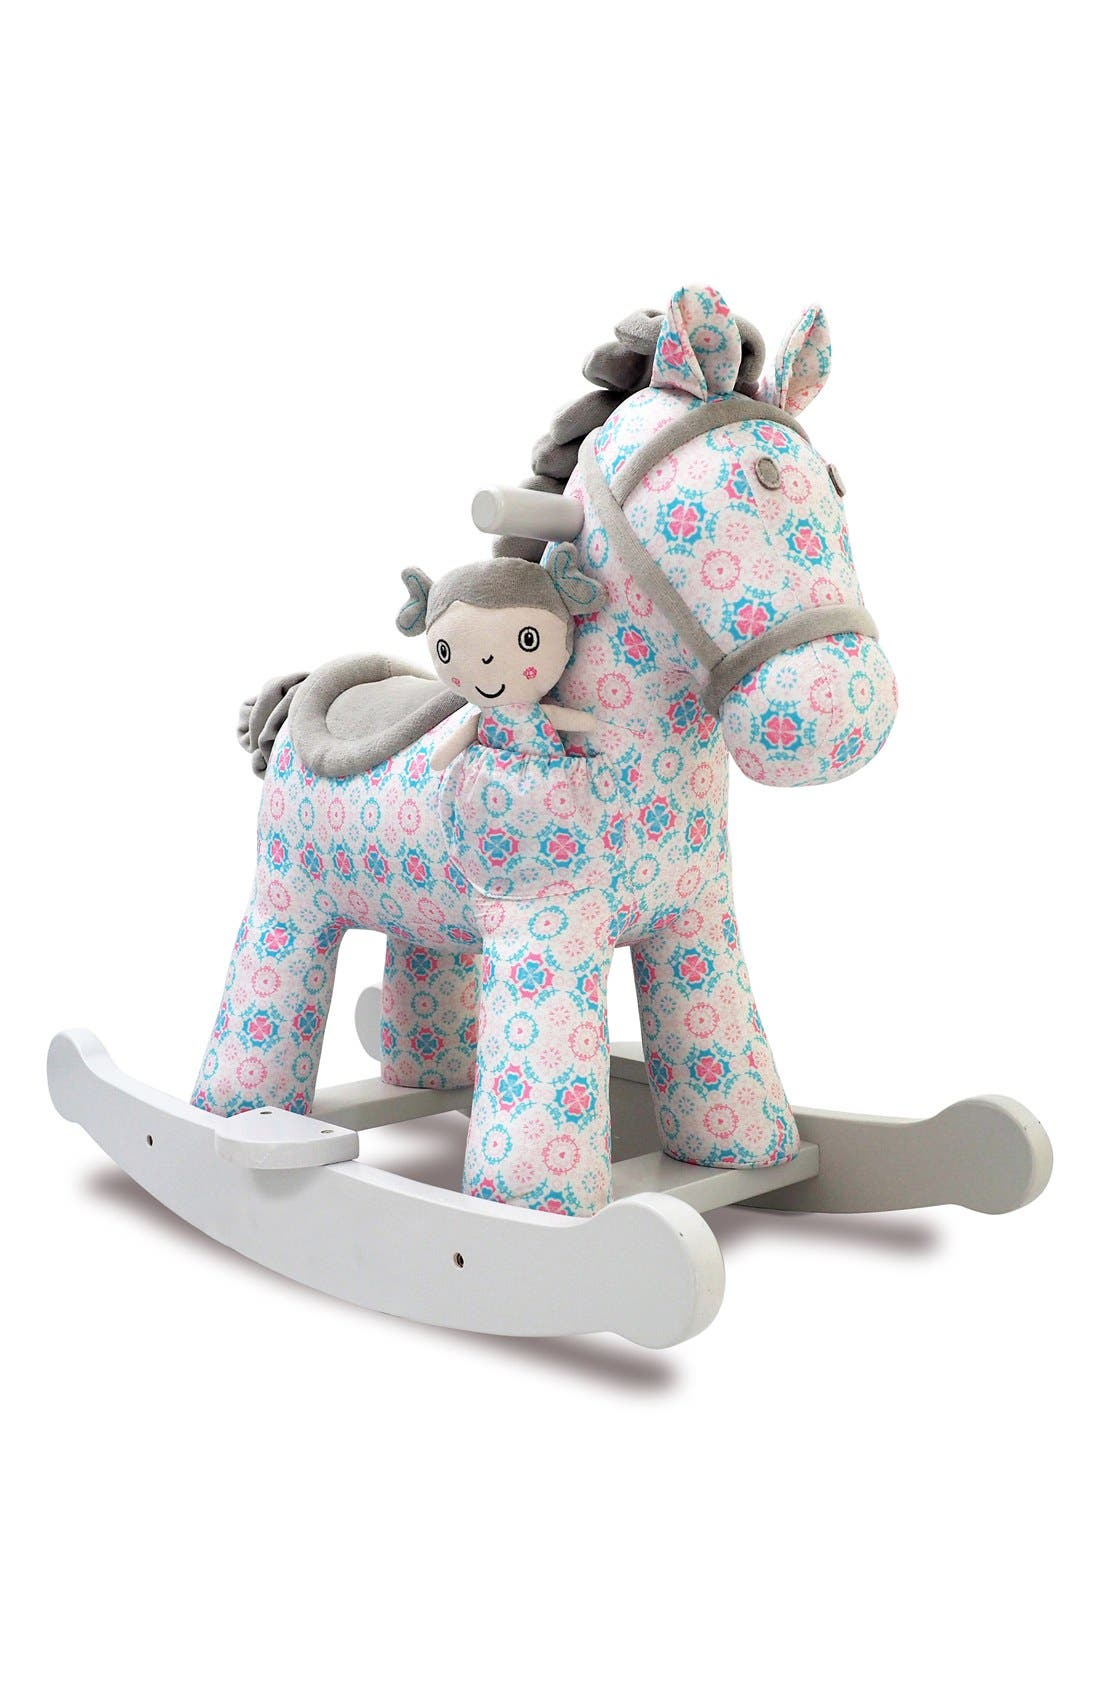 Rosie & Mae Rocking Horse & Stuffed Animal,                         Main,                         color, Pink